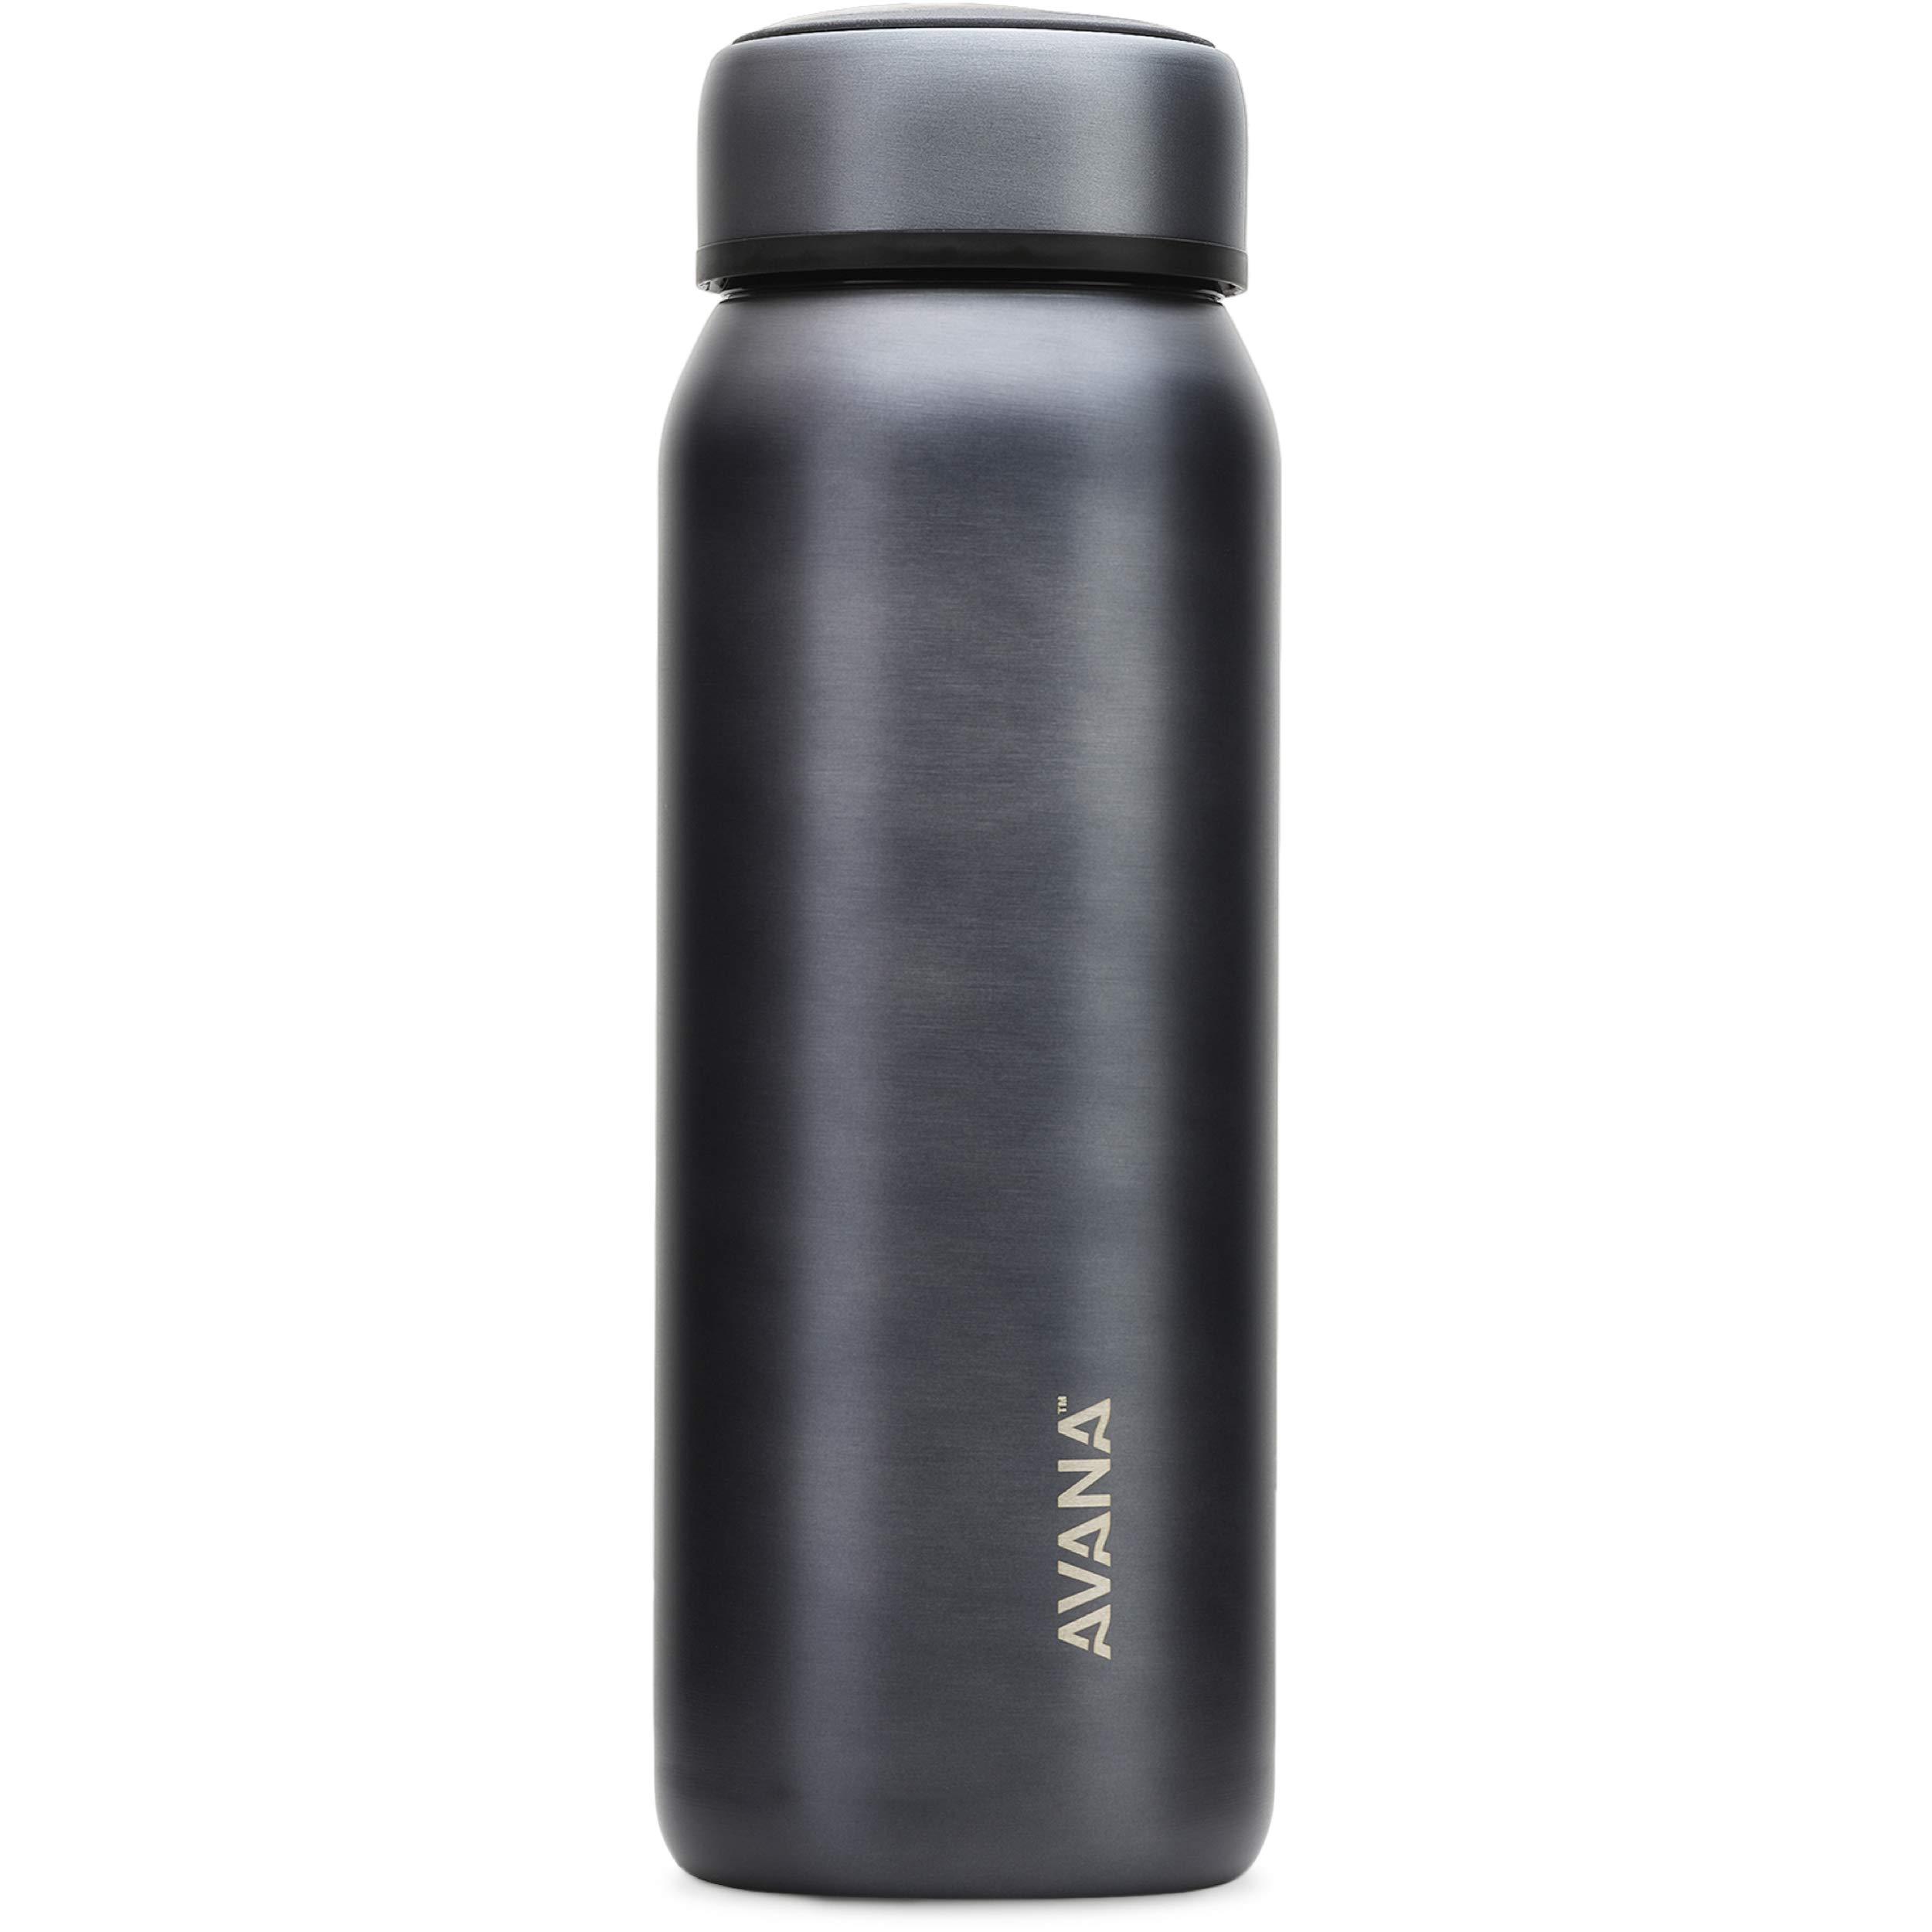 Avana Beckridge Stainless Steel Double-Wall Insulated Water Bottle, 32oz, Gunmetal by Avana